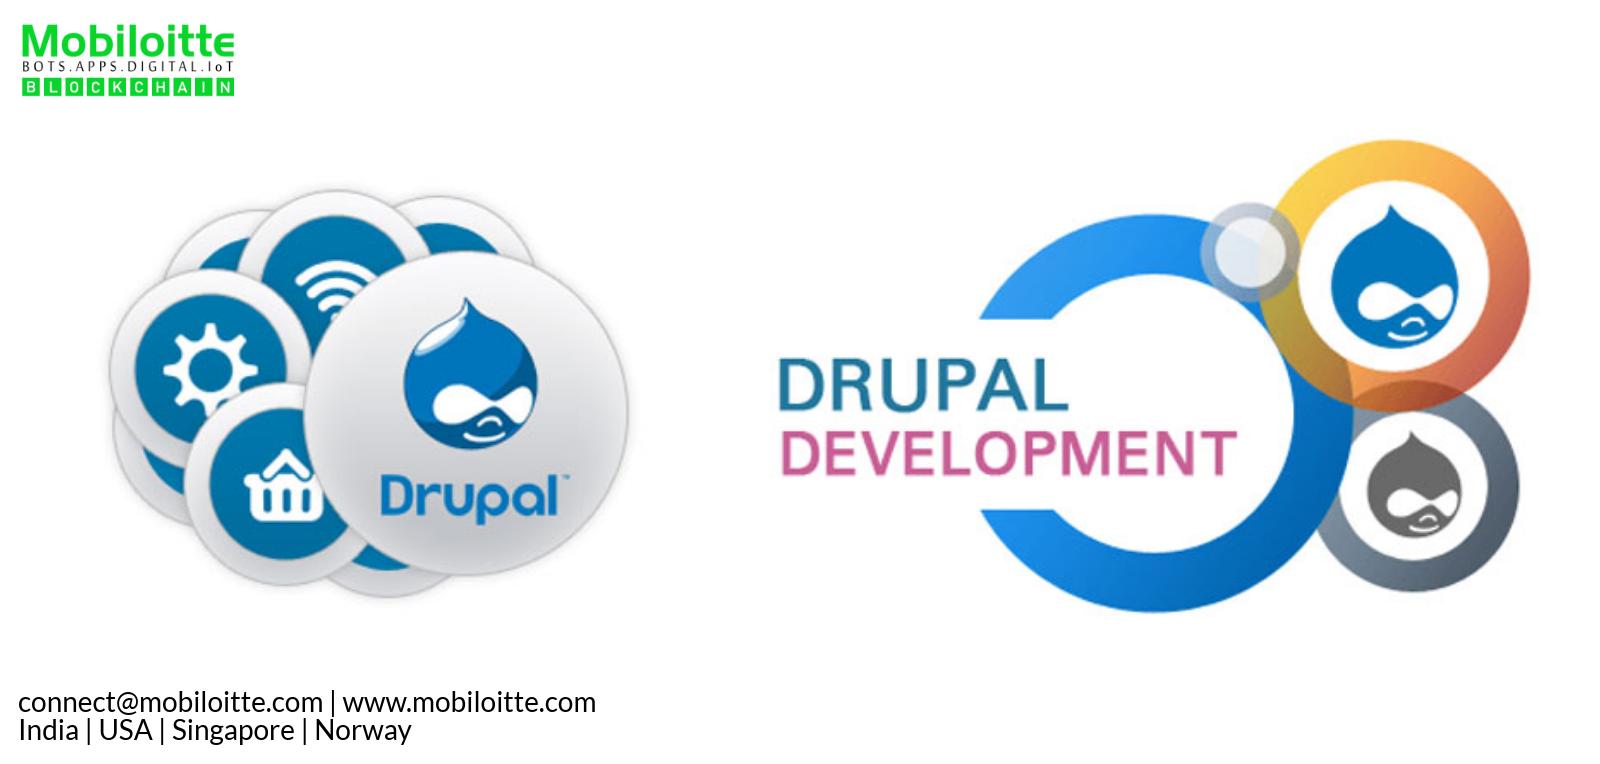 Drupal Development Web Development Design Drupal Web Development